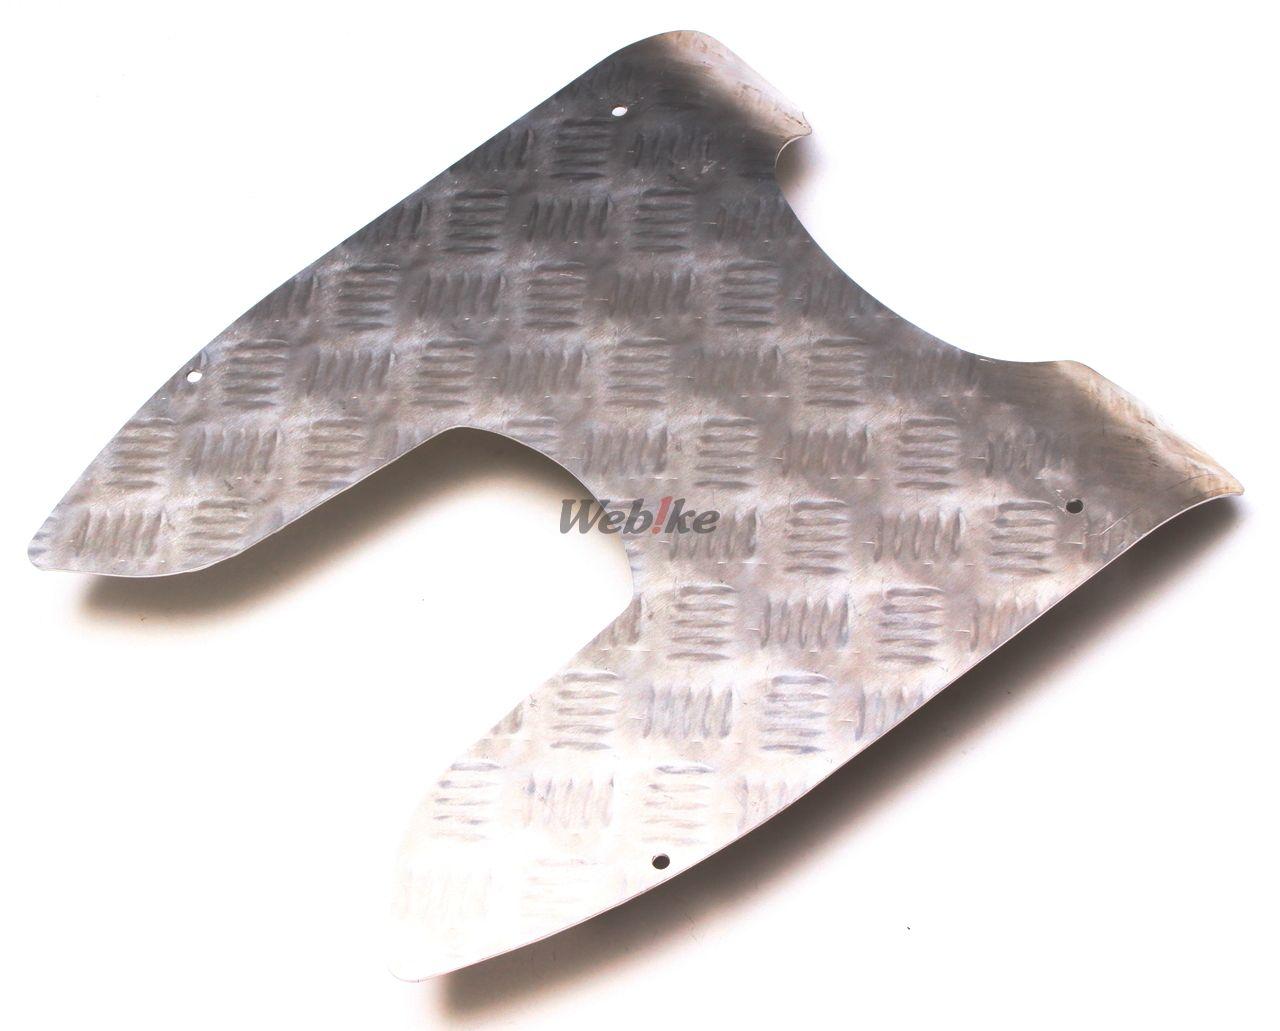 【KIJIMA】腳踏板(鋁合金製) - 「Webike-摩托百貨」